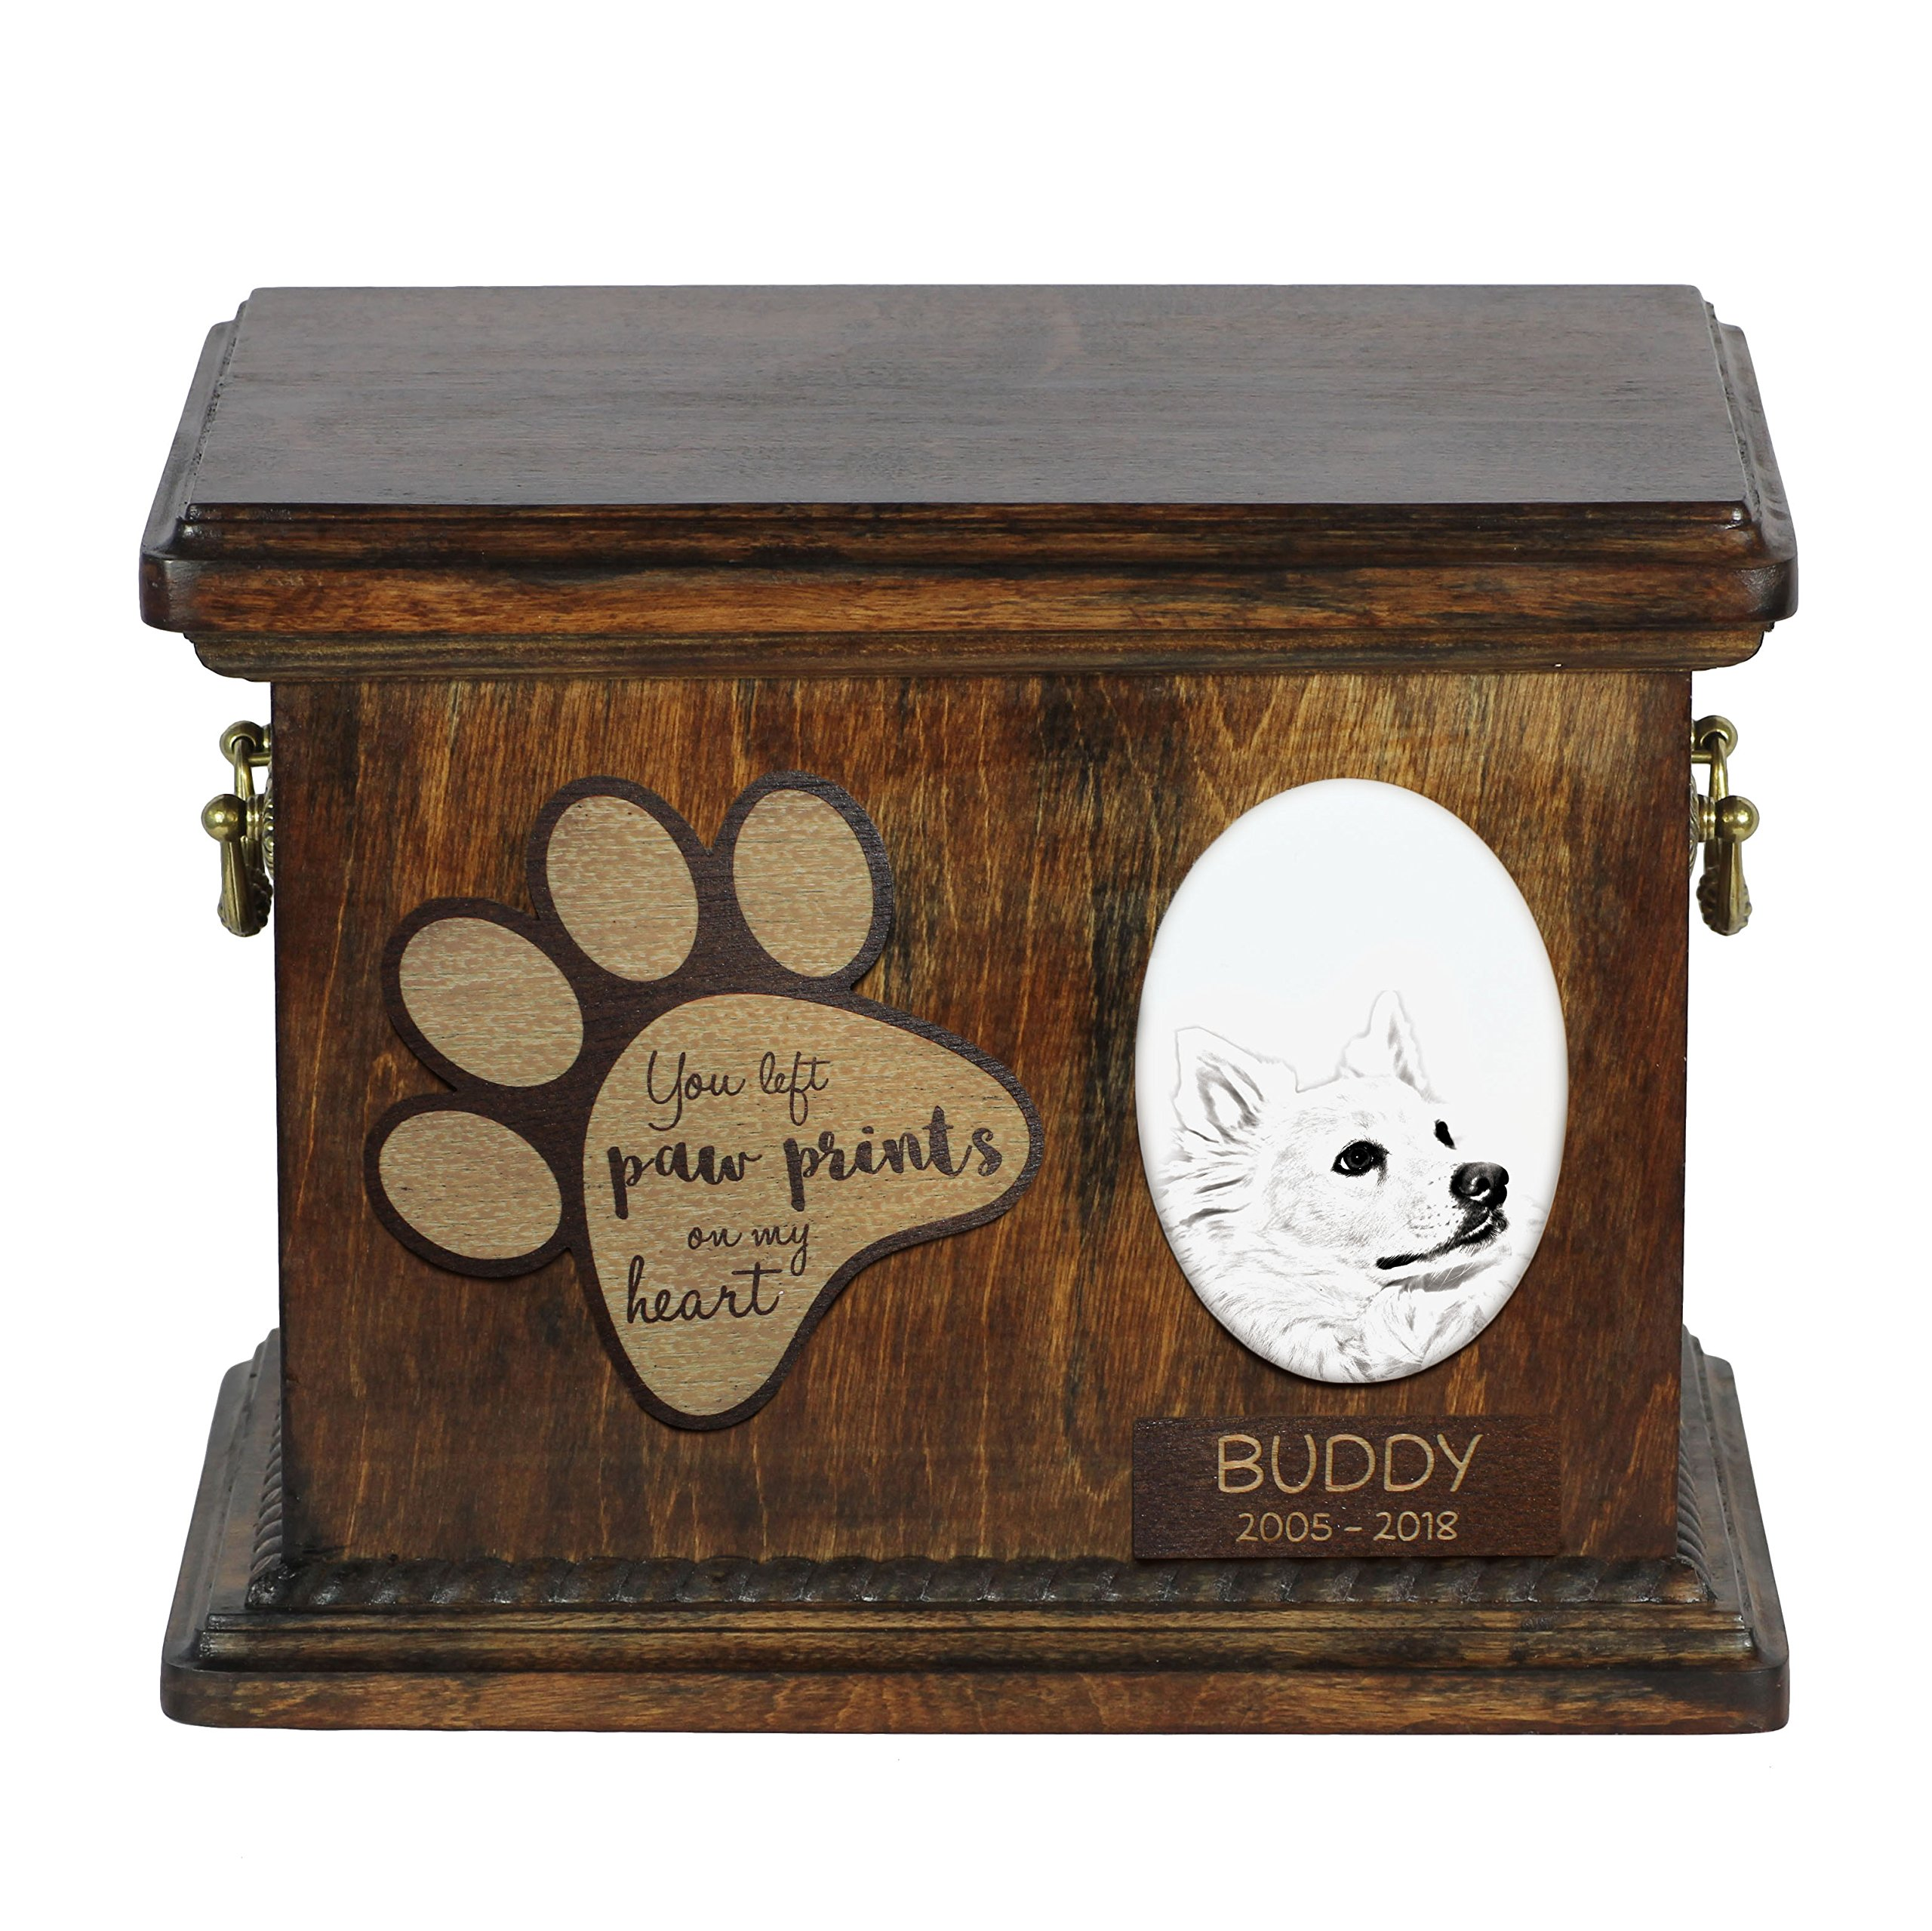 ArtDog Ltd. American Eskimo Dog, urn for dog's ashes with ceramic plate and description